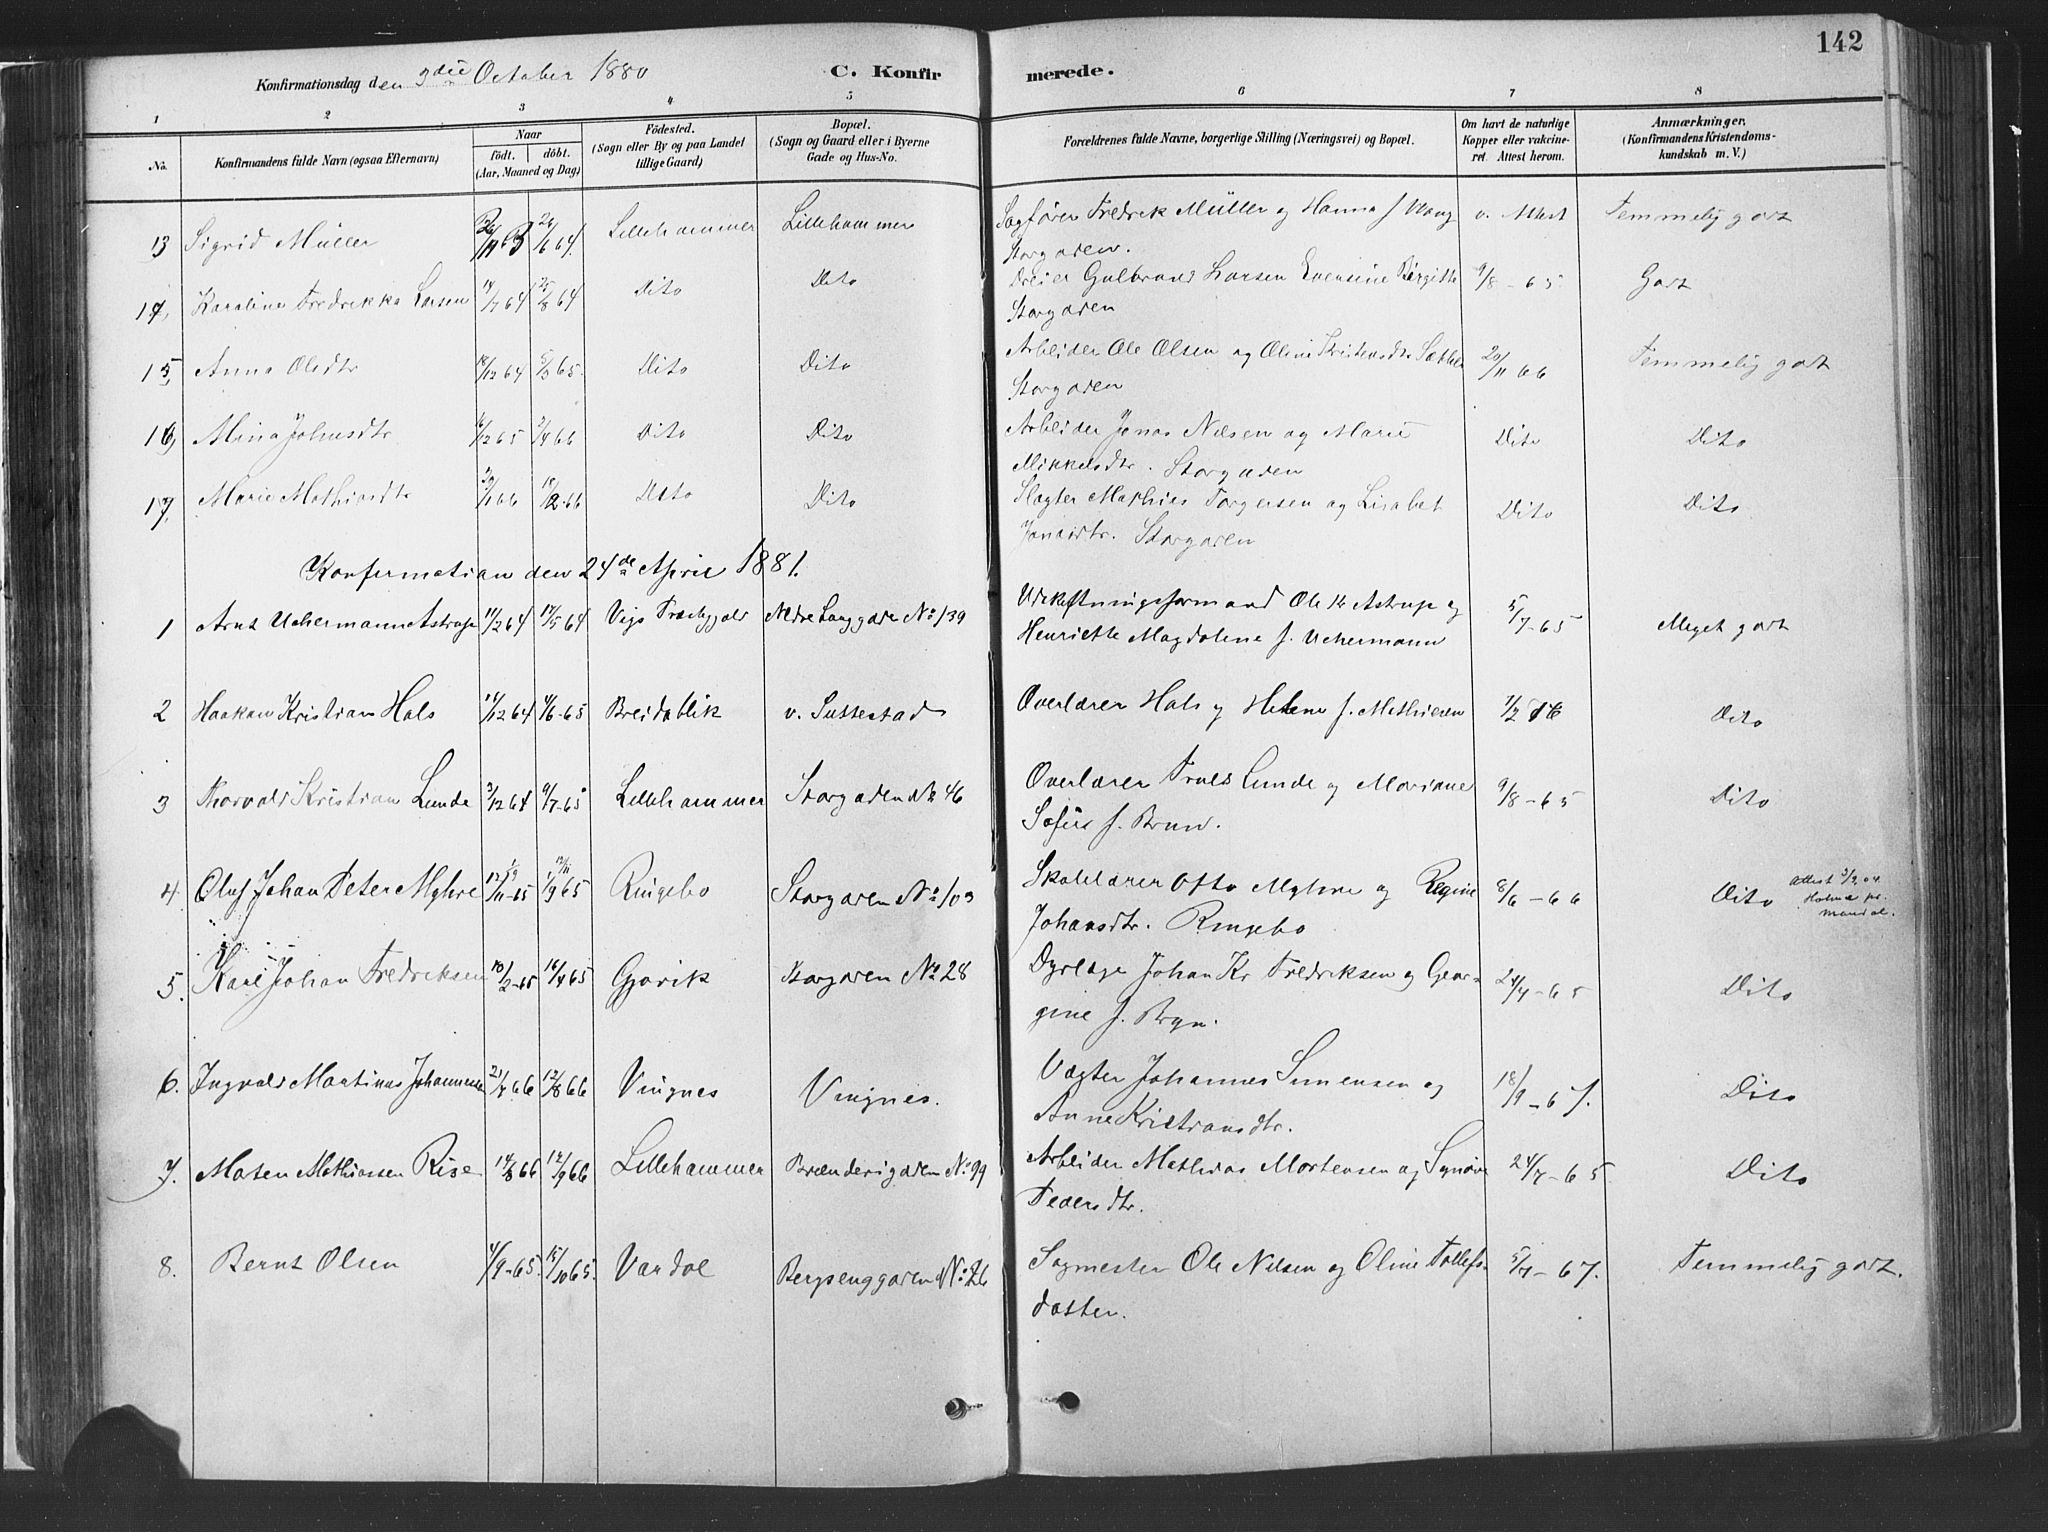 SAH, Fåberg prestekontor, H/Ha/Haa/L0010: Parish register (official) no. 10, 1879-1900, p. 142